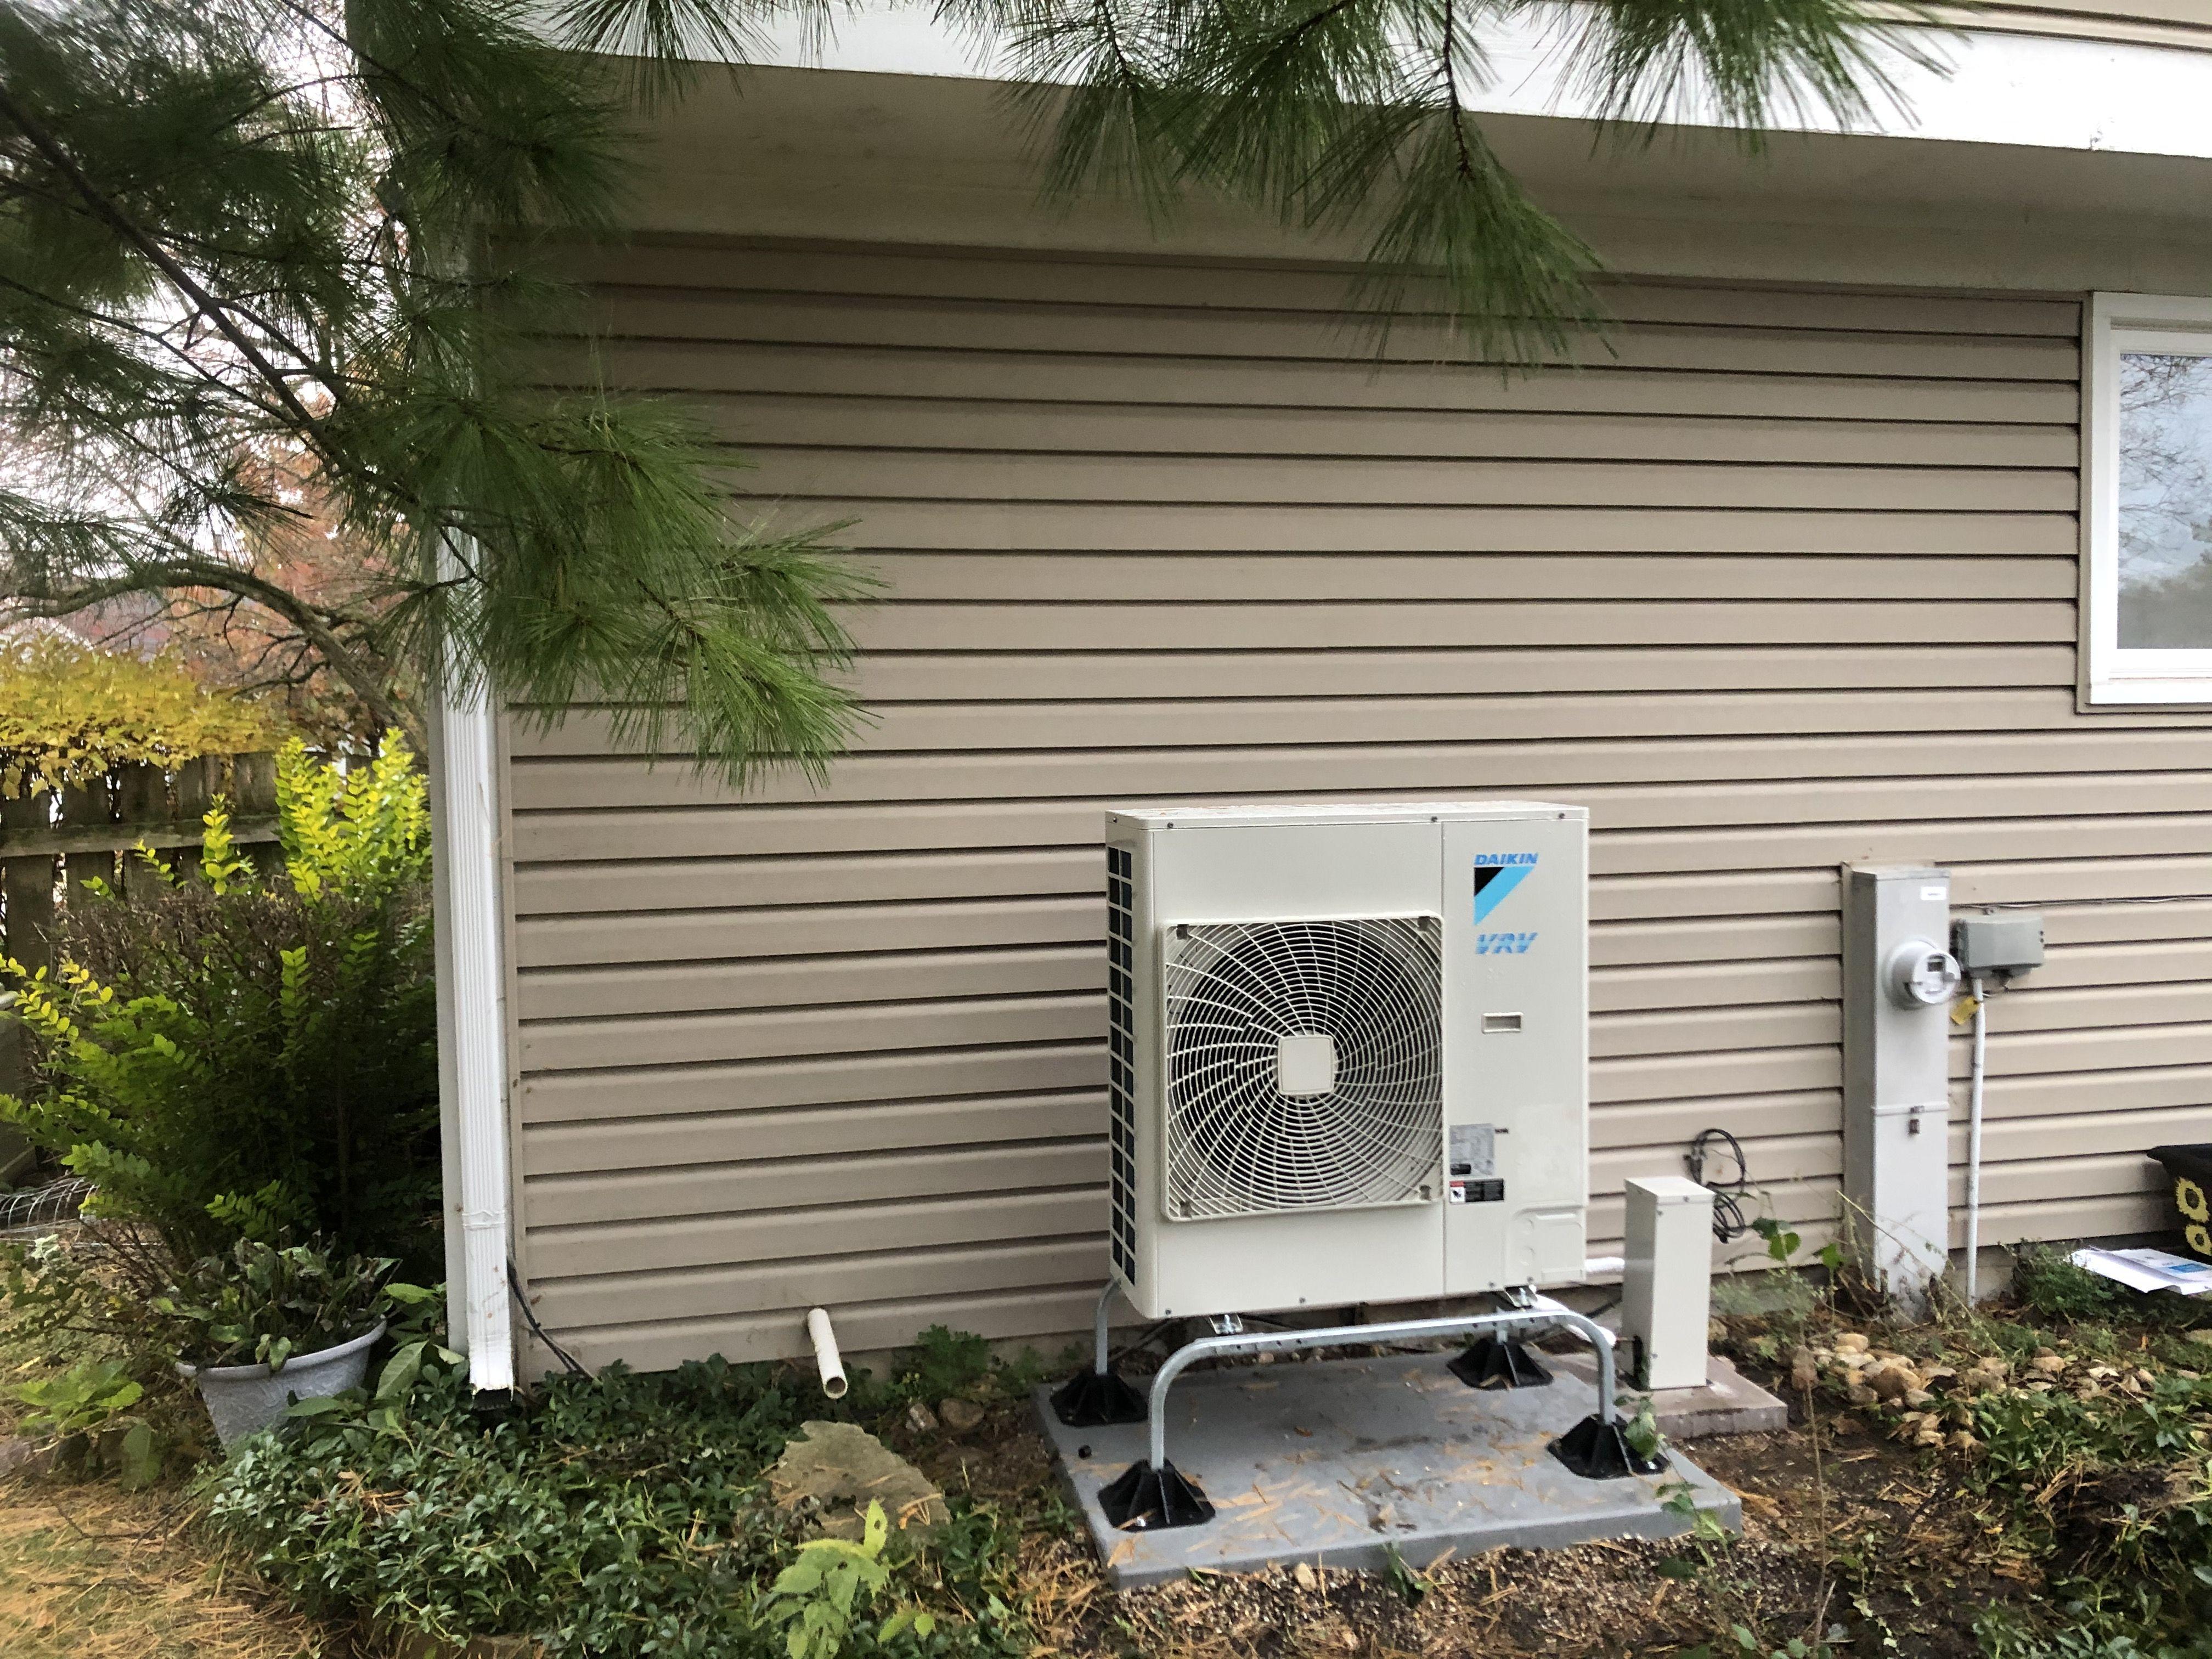 Daikin VRV Life heat pump installed with a Daikin